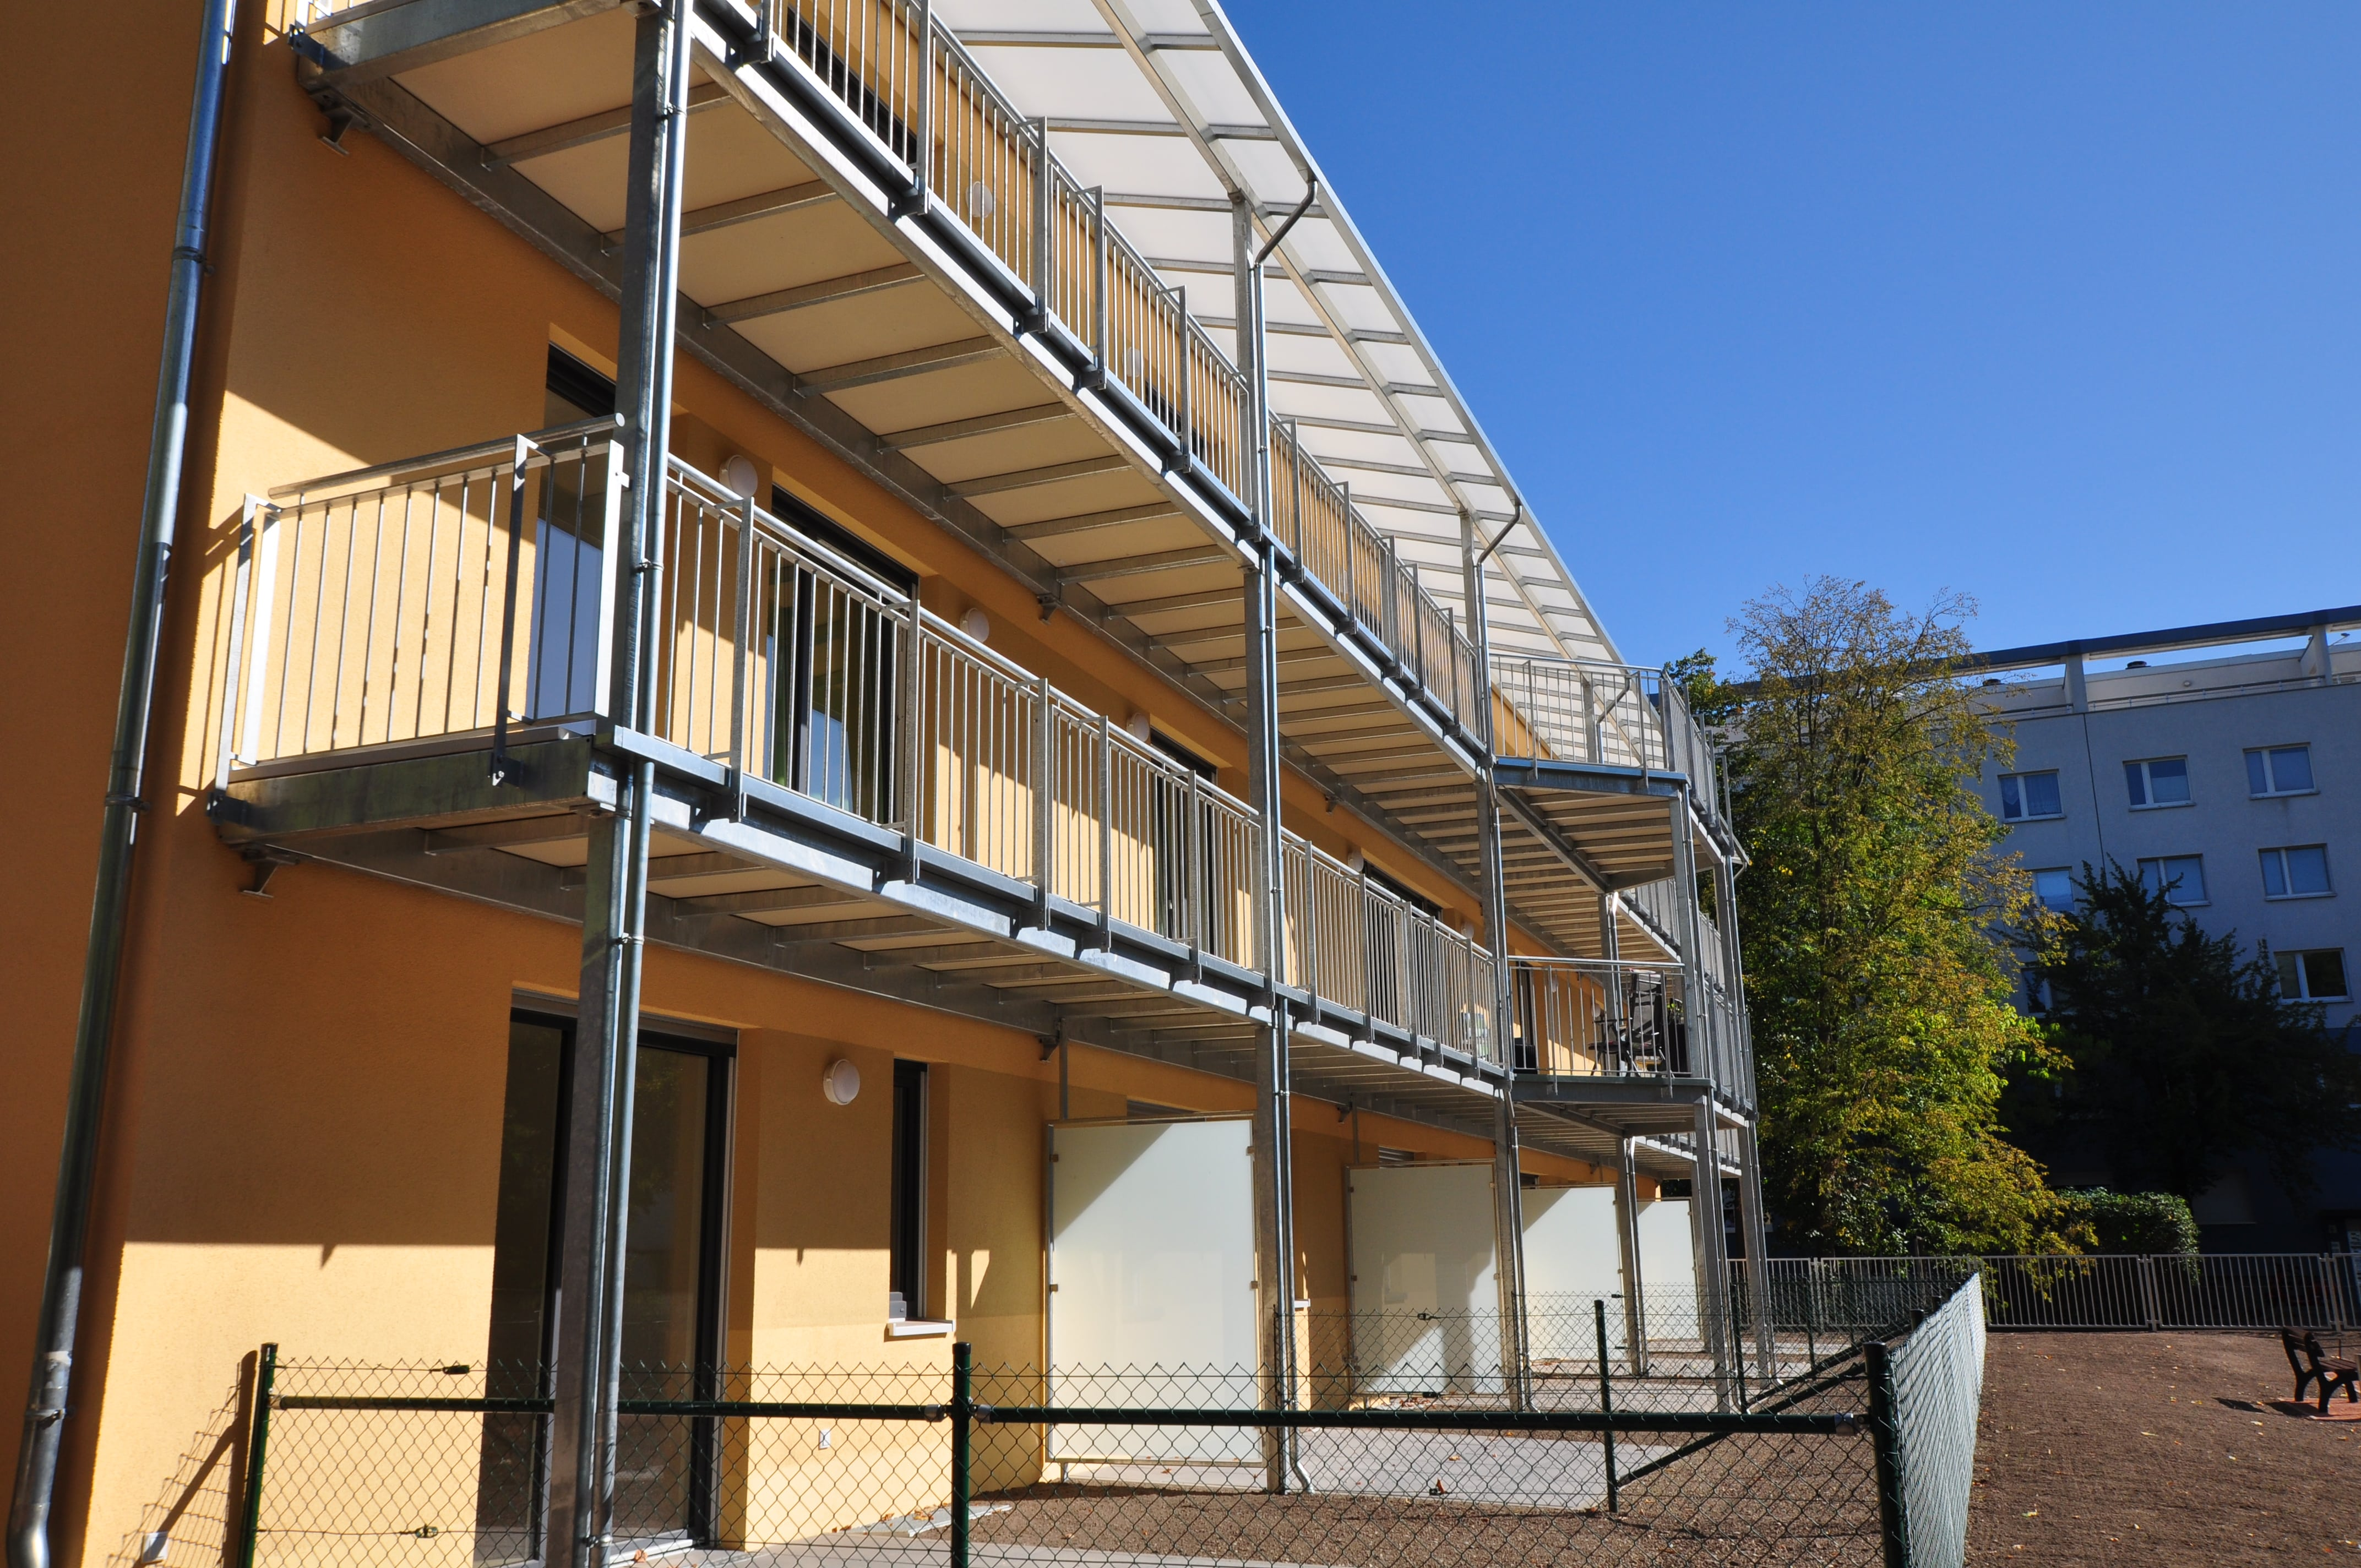 Gustav-Weidanz-Weg Balkone